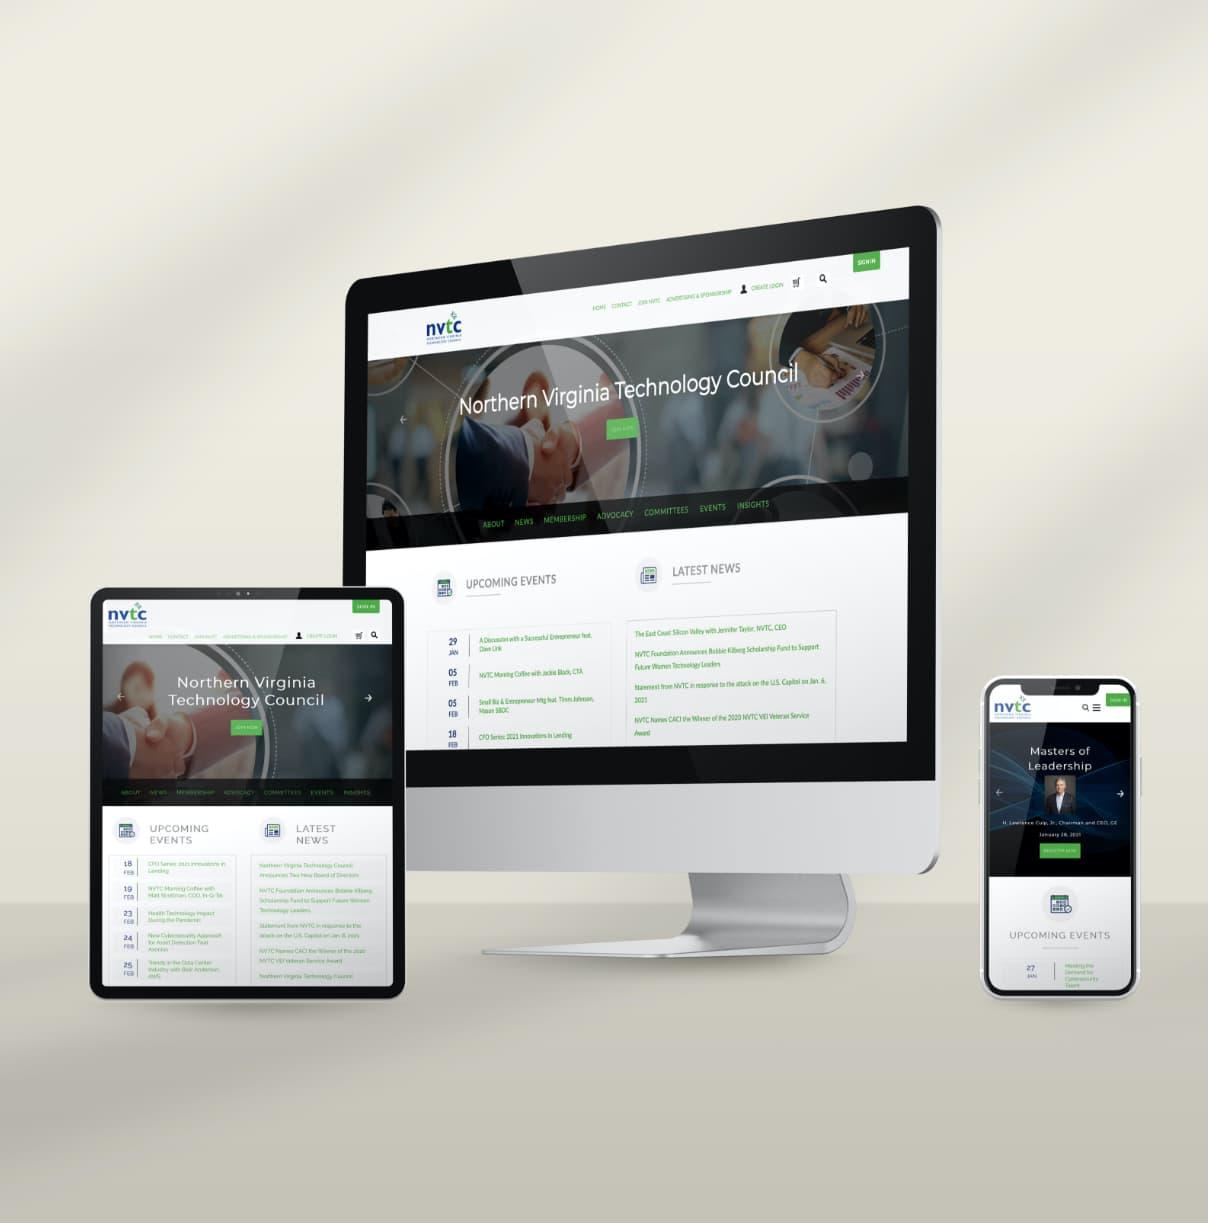 Northern Virginia Technology Council website design and development